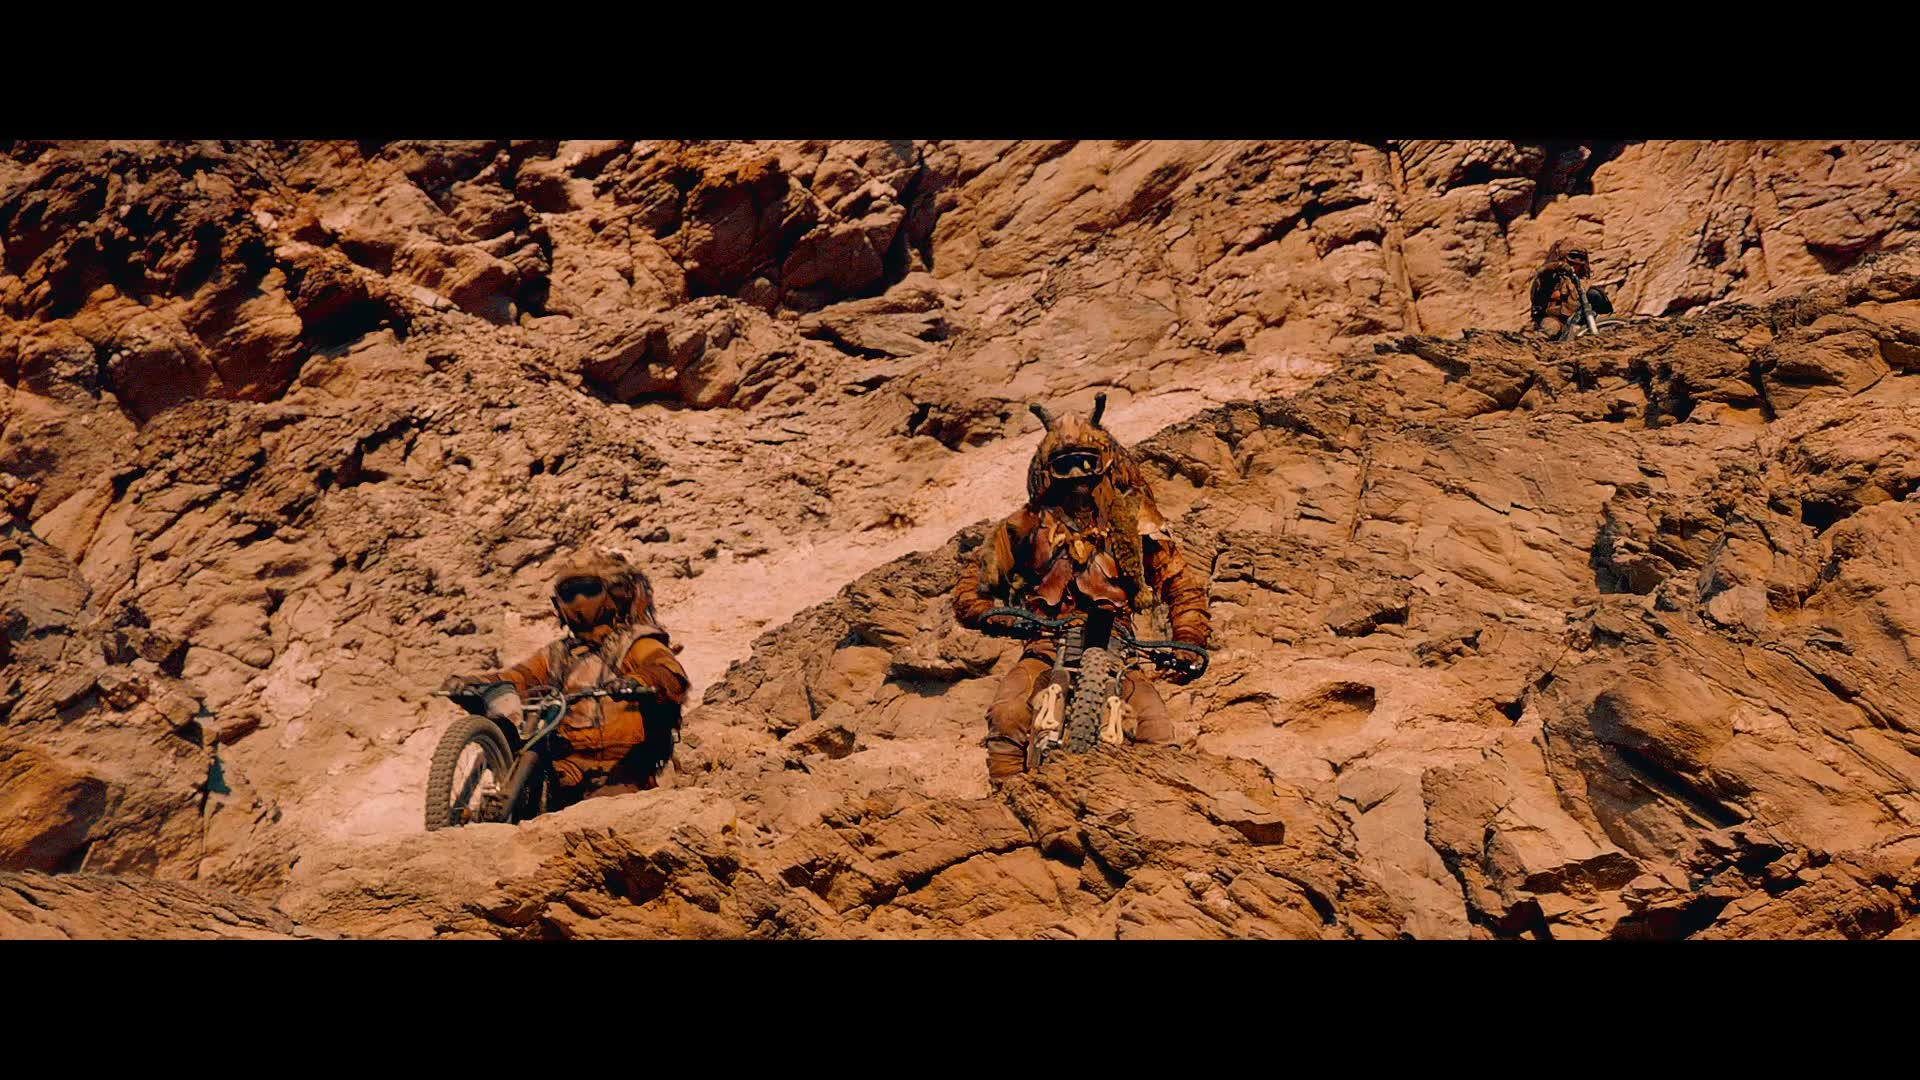 Mad Max: Fury Road full movie in italian 720p download